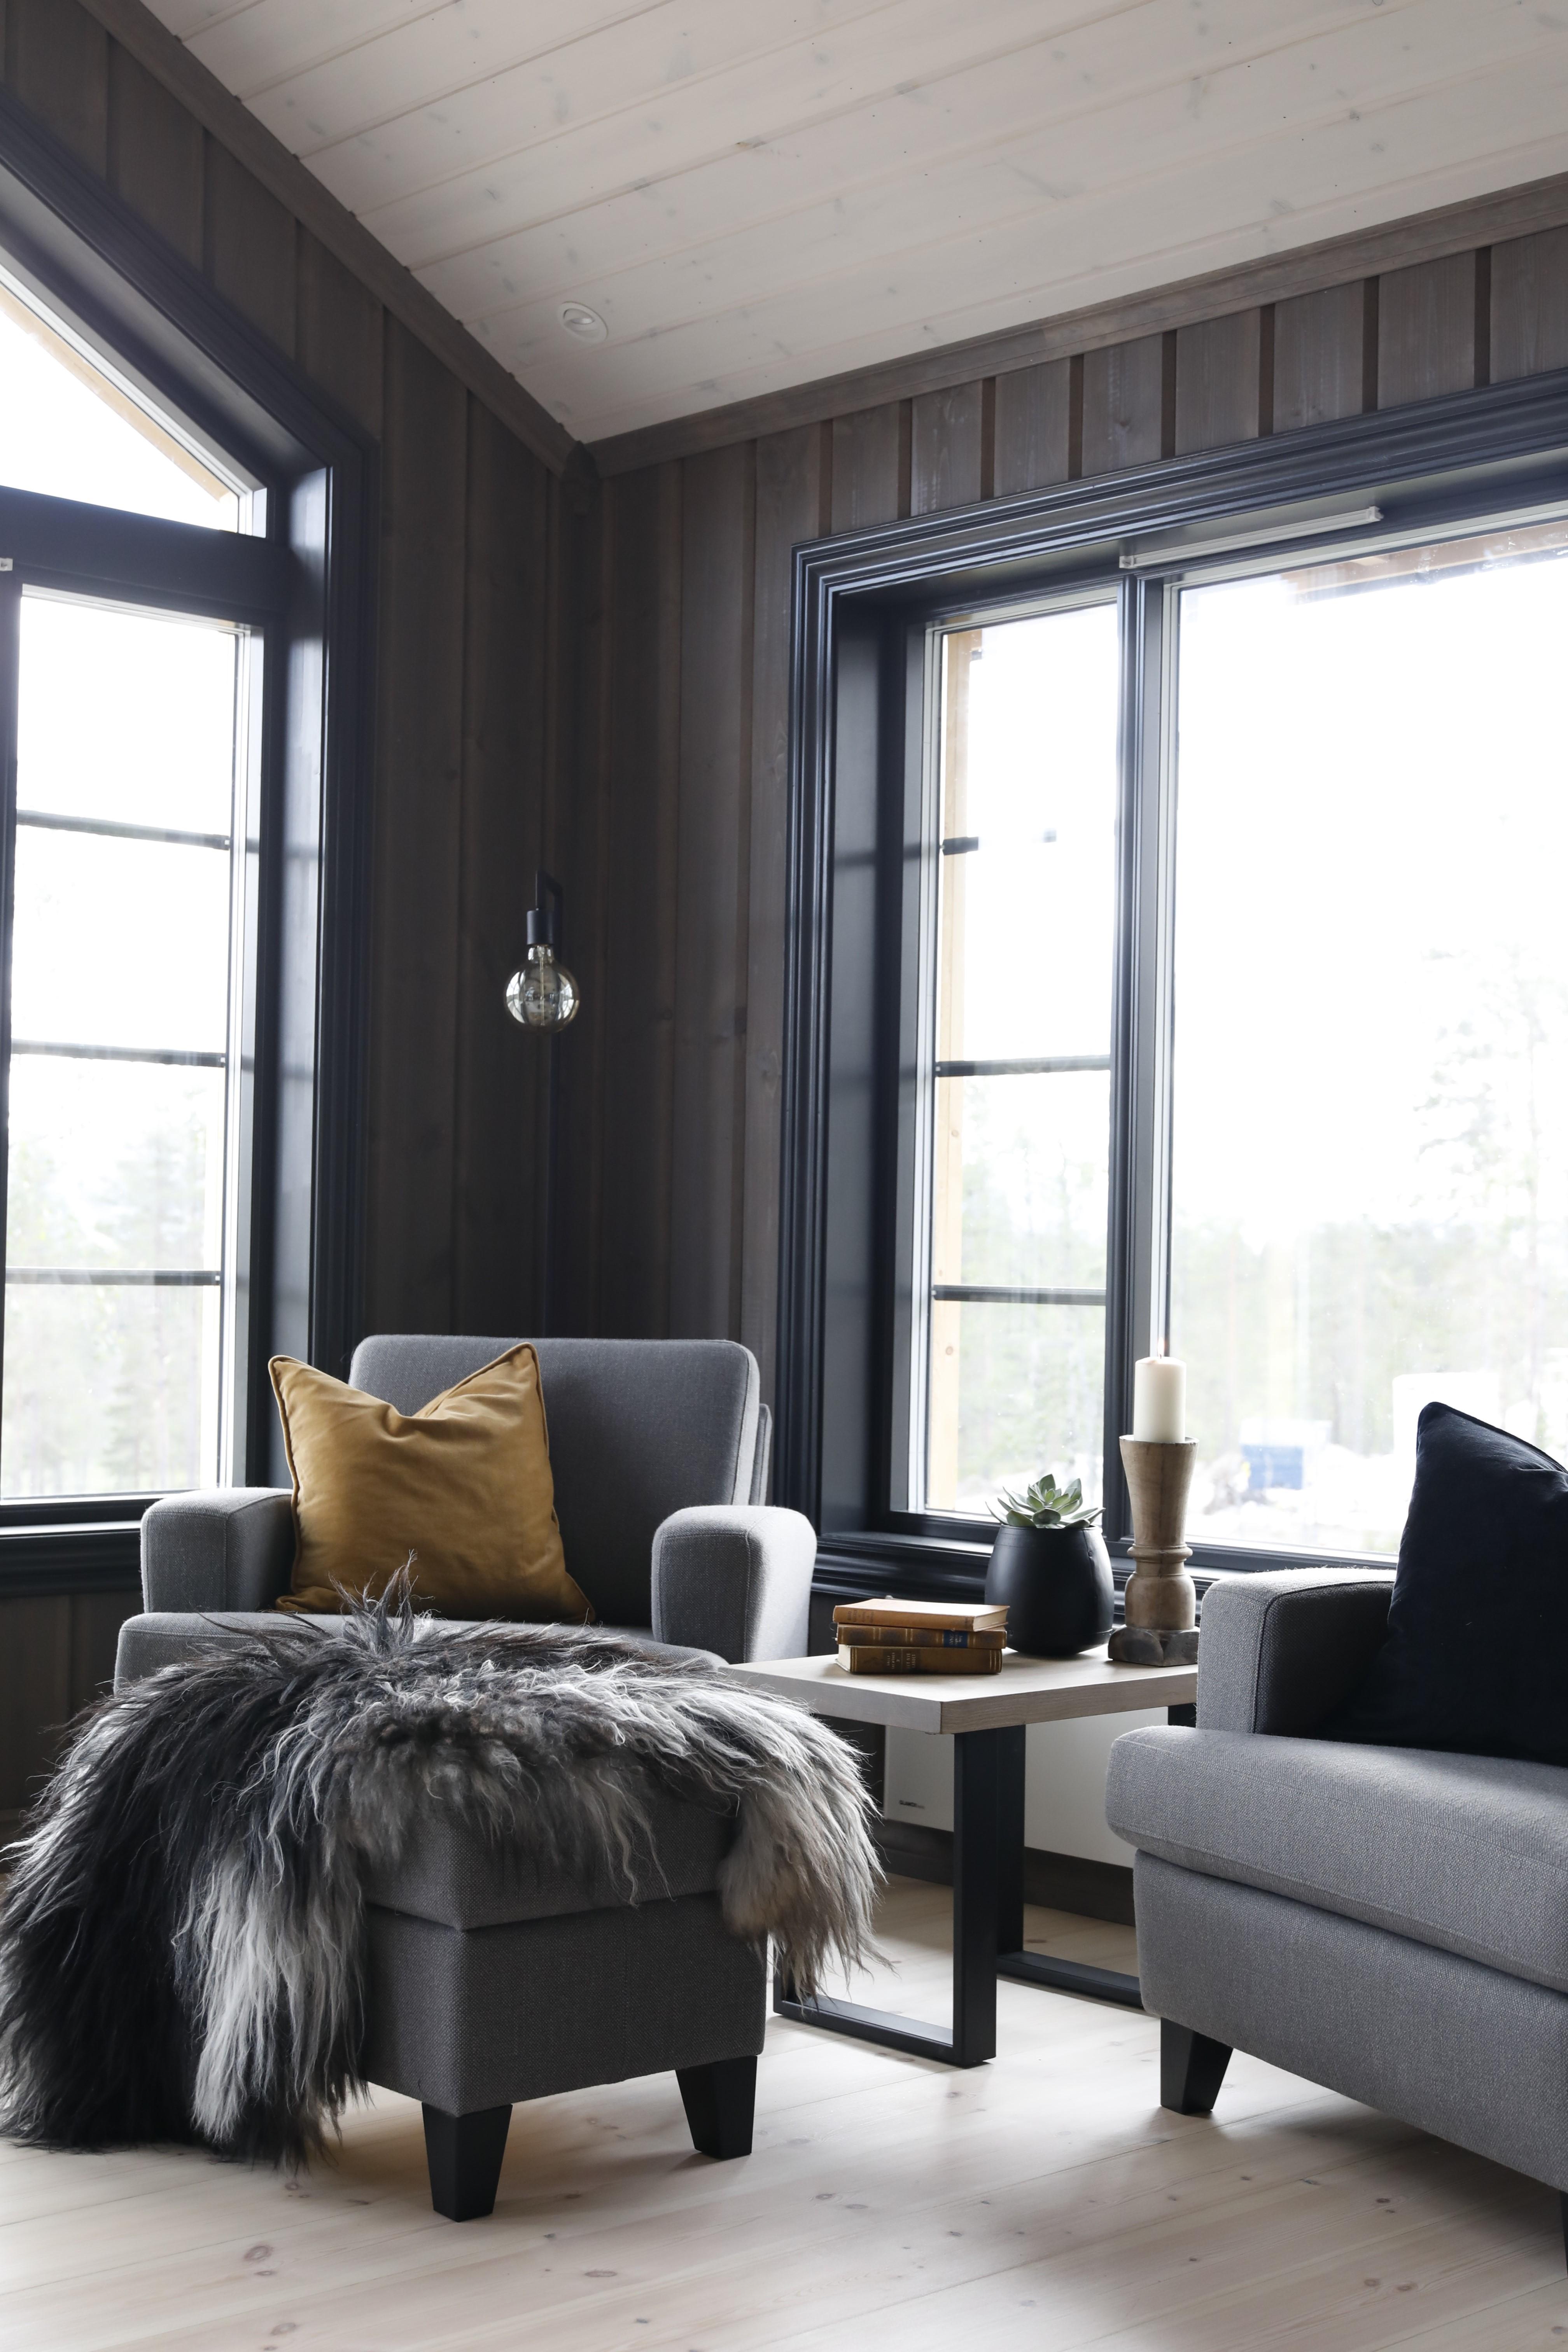 Telemarkhytter Storeble Panorama oppstue 10